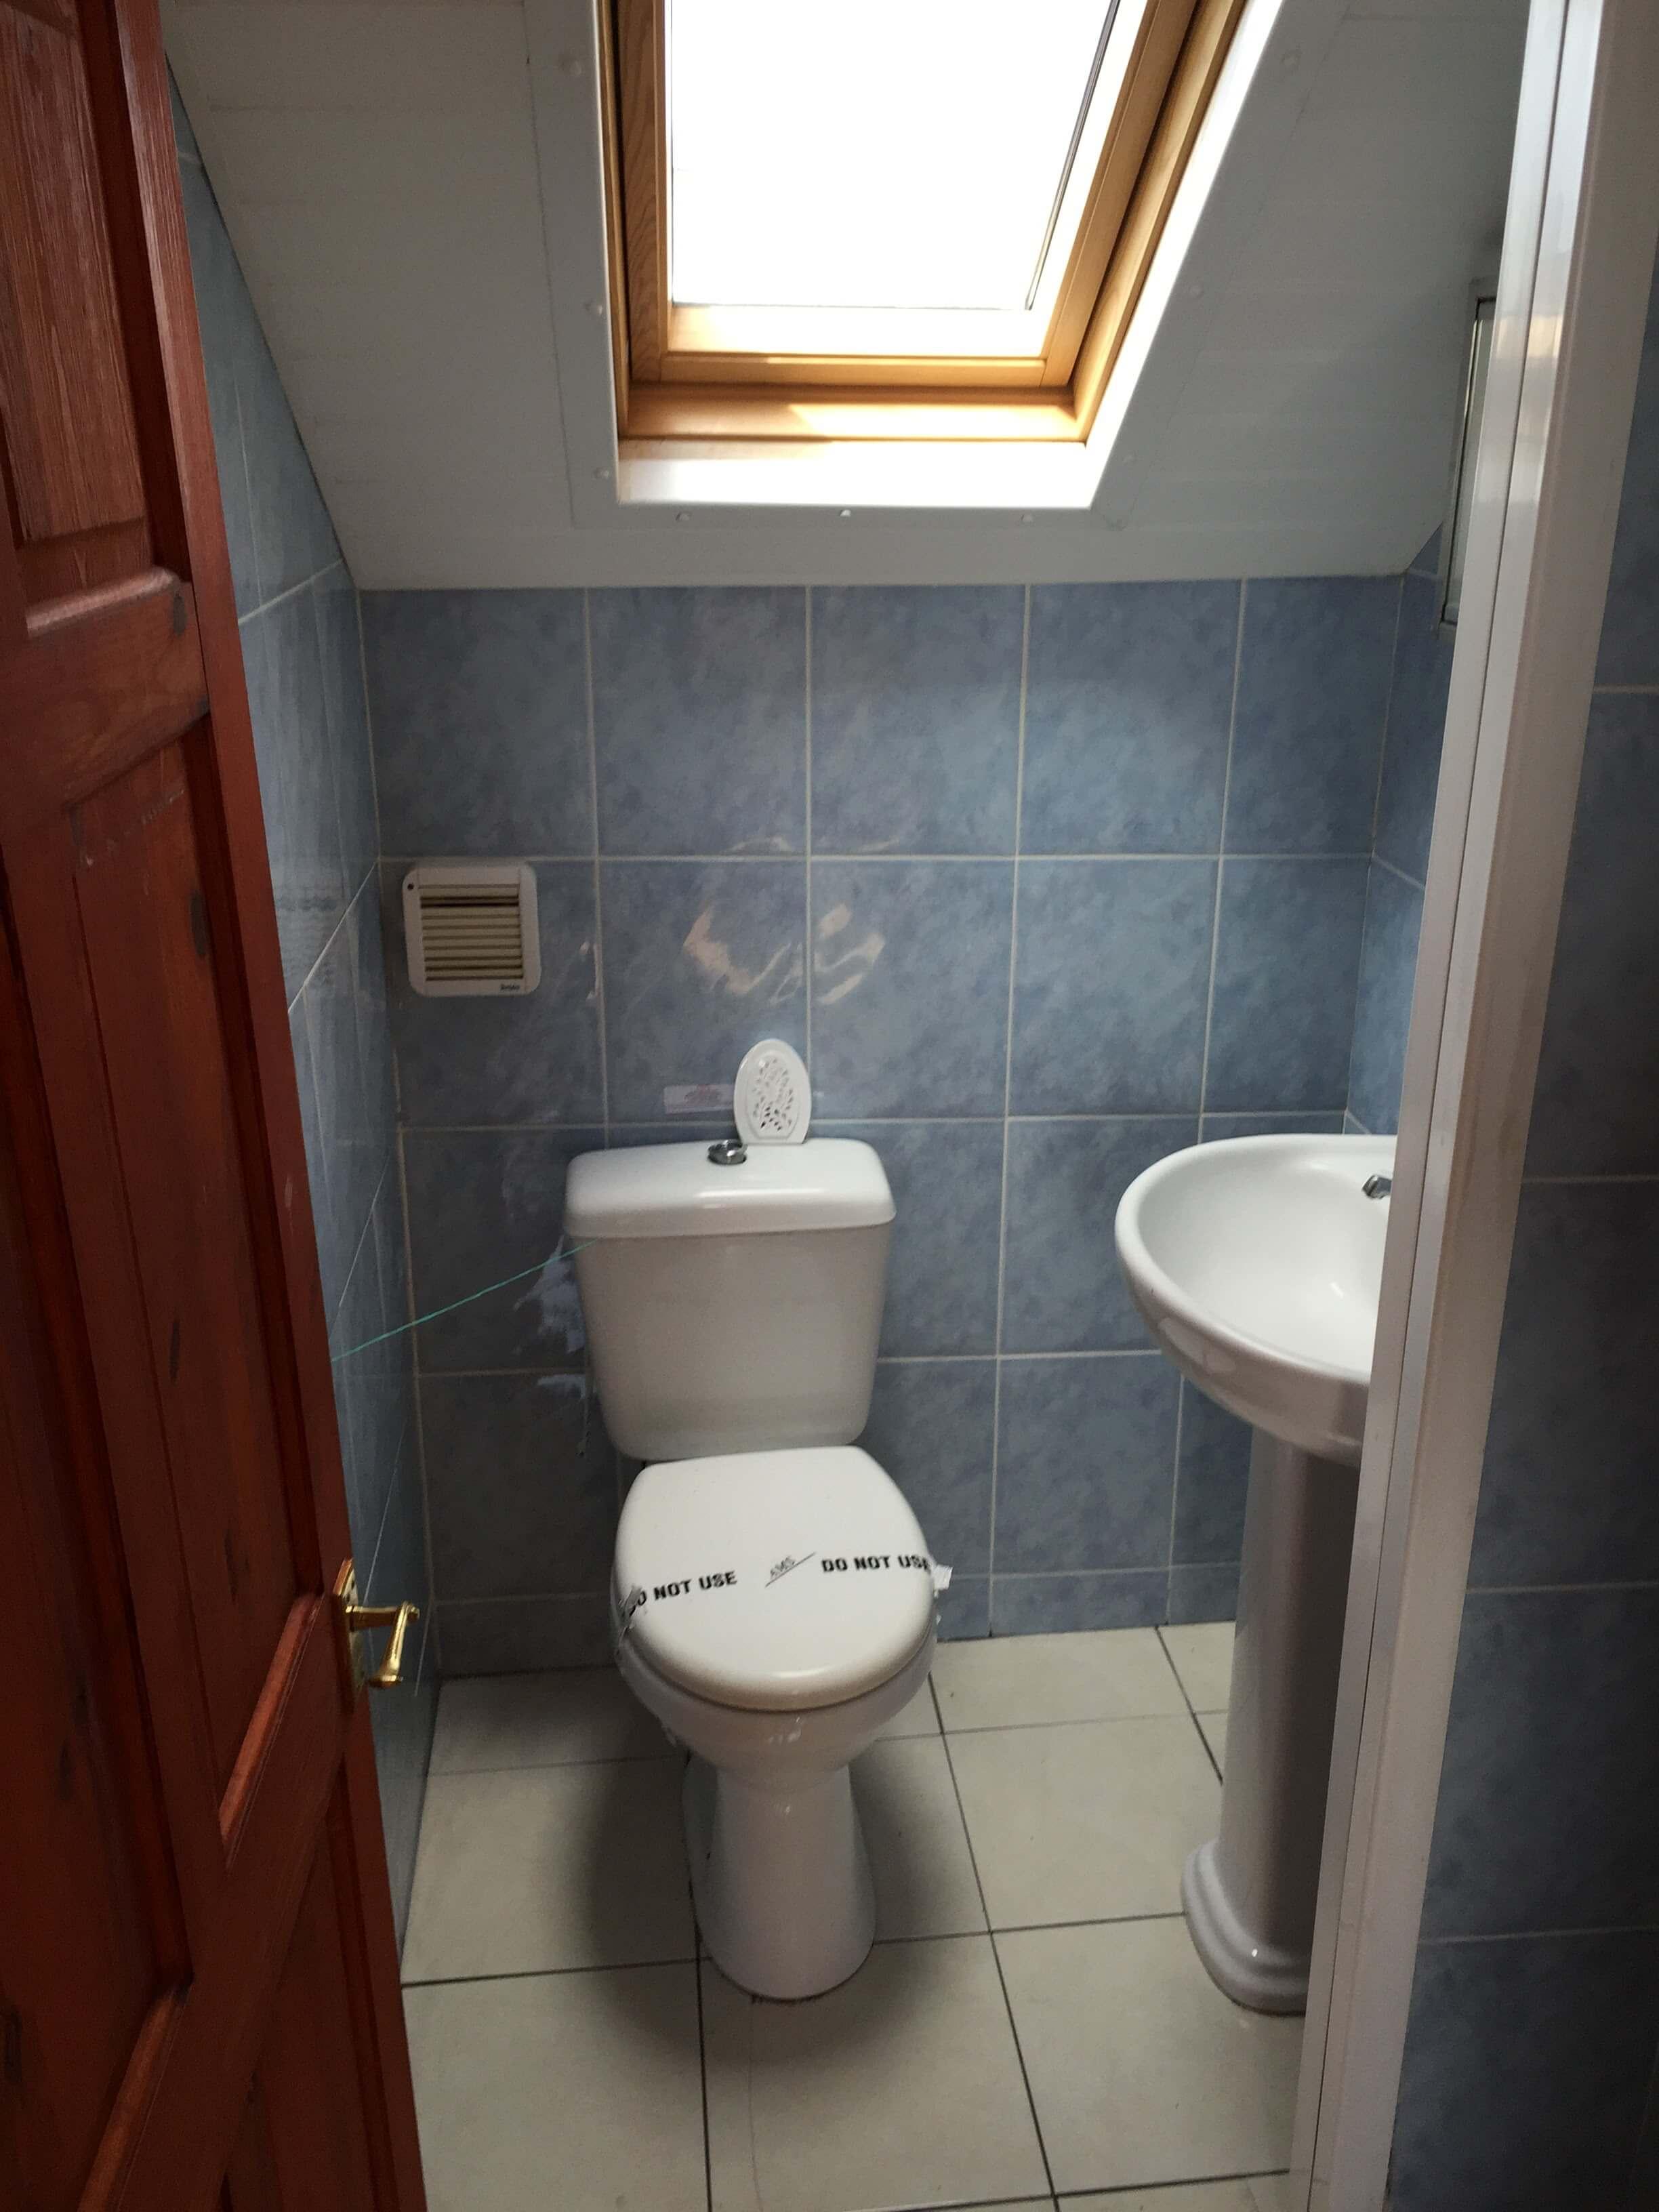 Bathroom after interior decoration